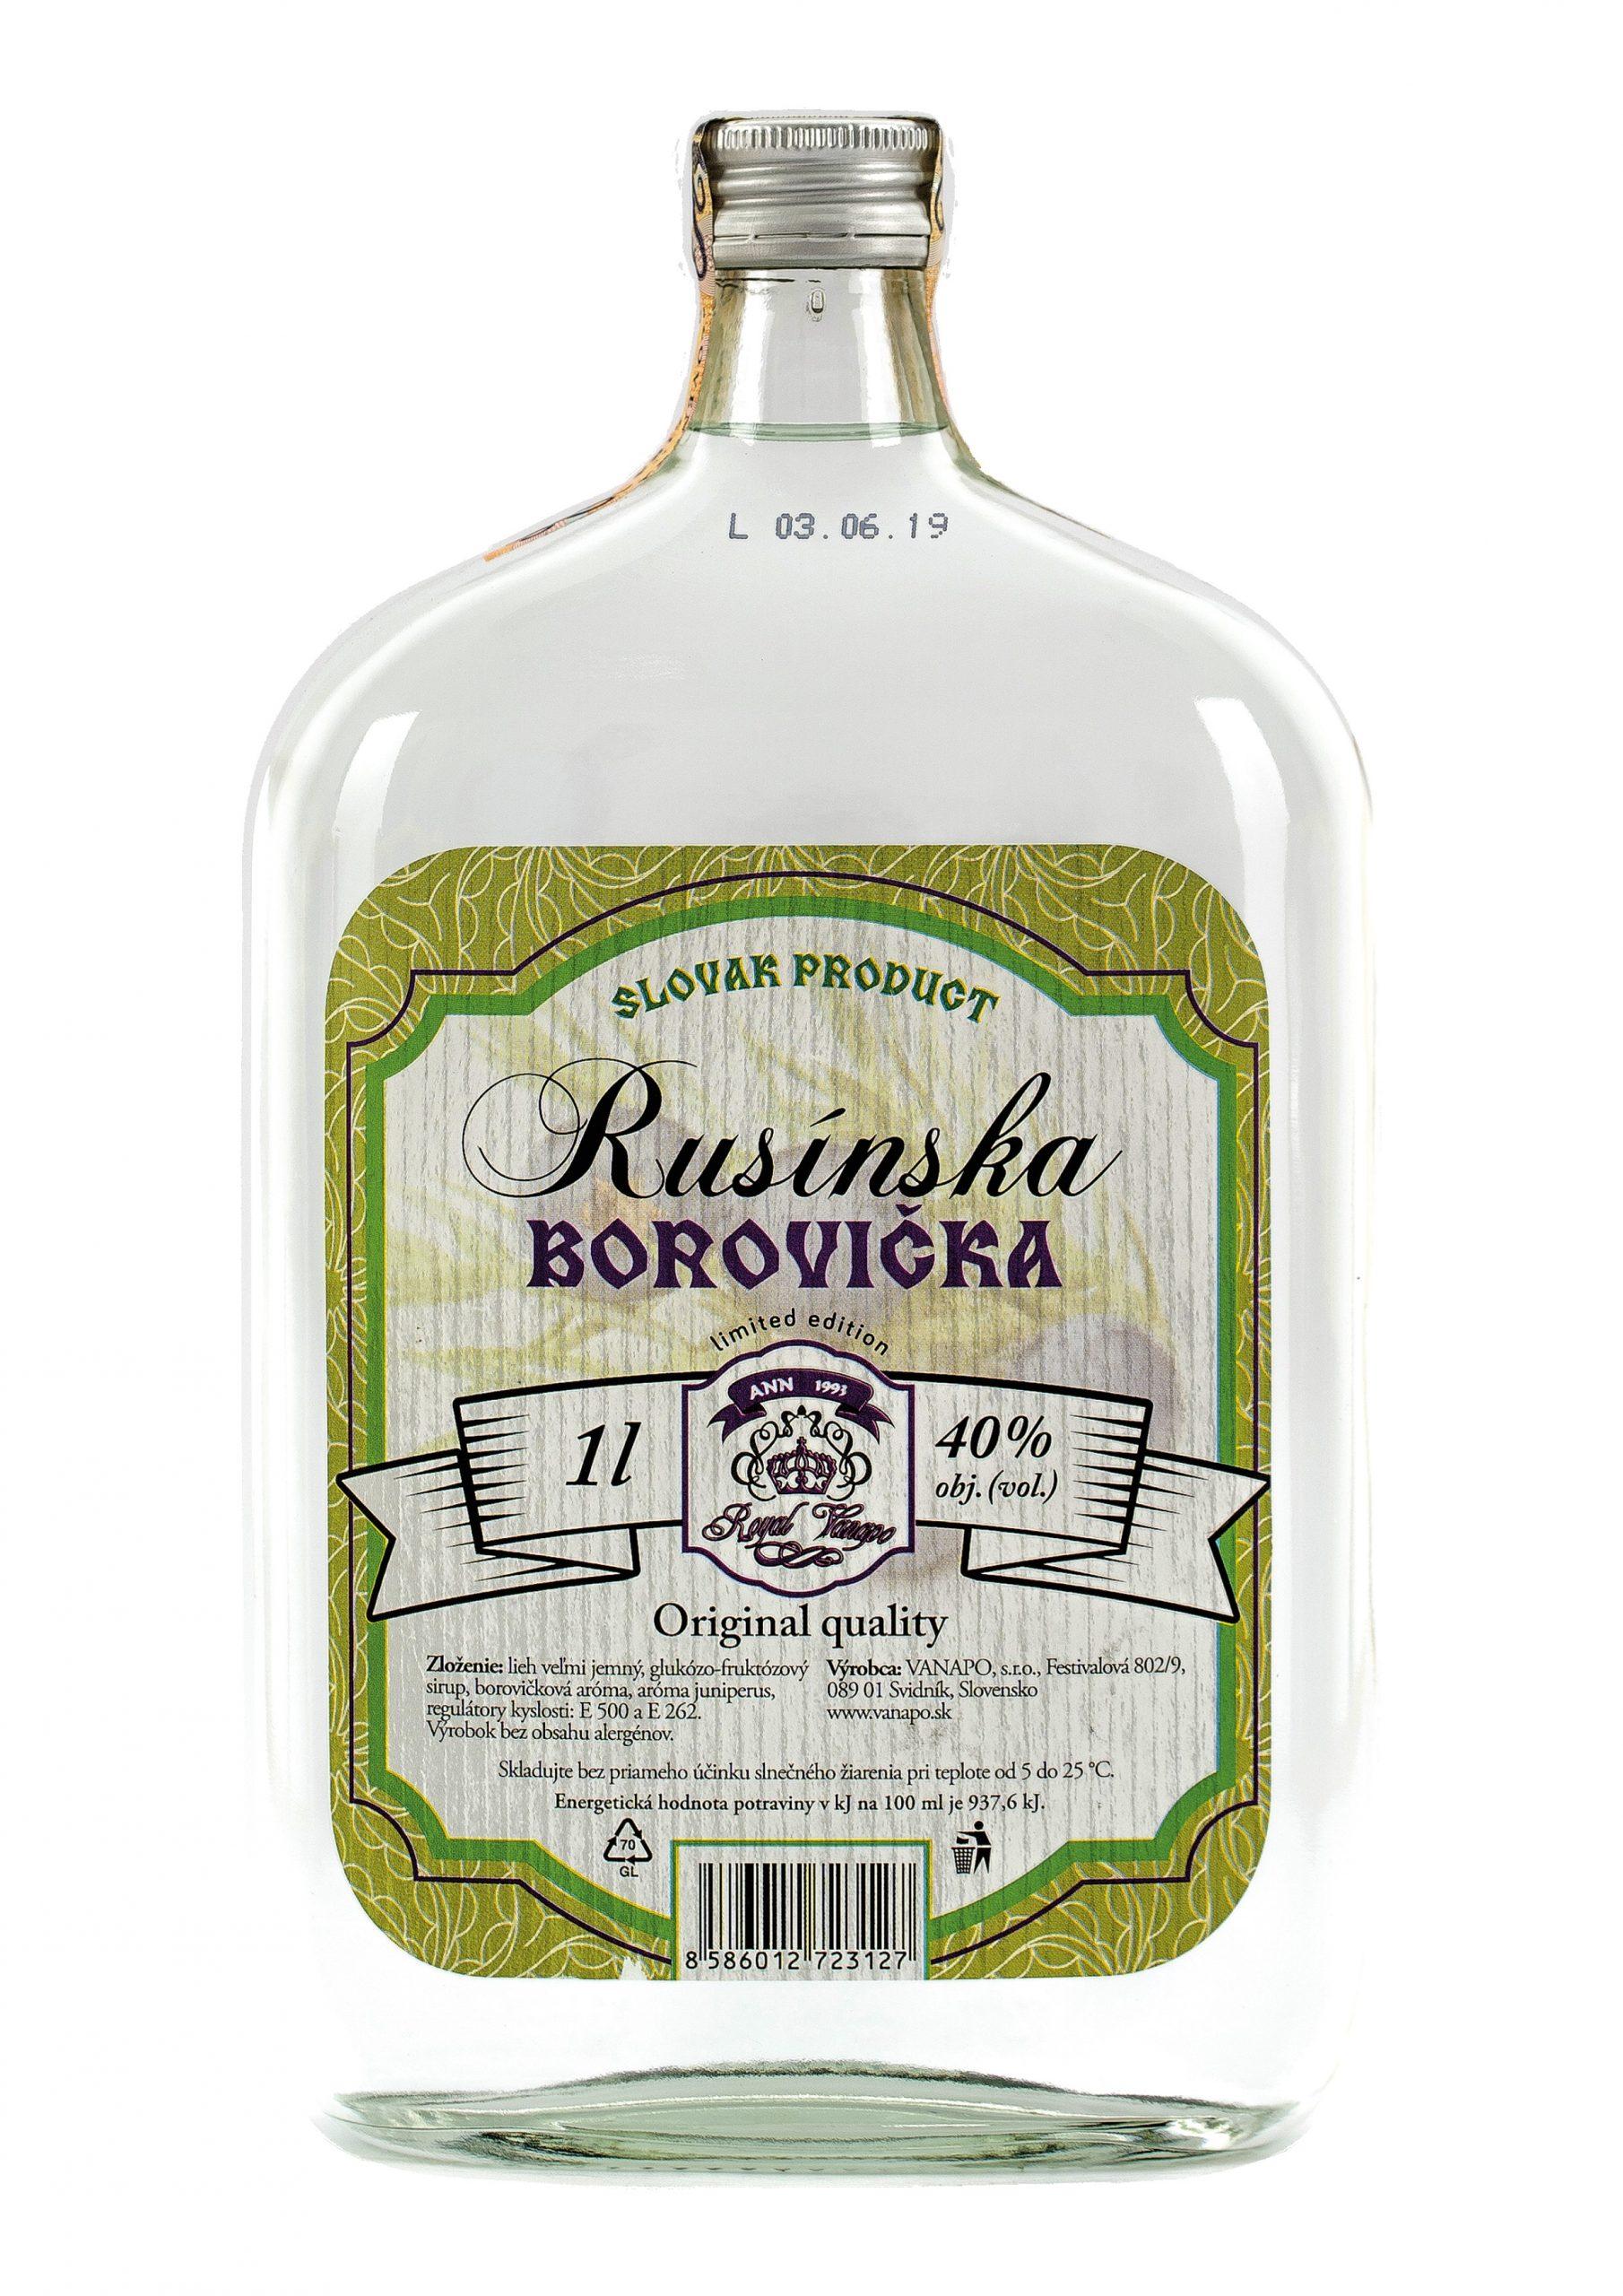 Borovicka Rusinska 40 1L scaled 1 - Rusínska Borovička Royal